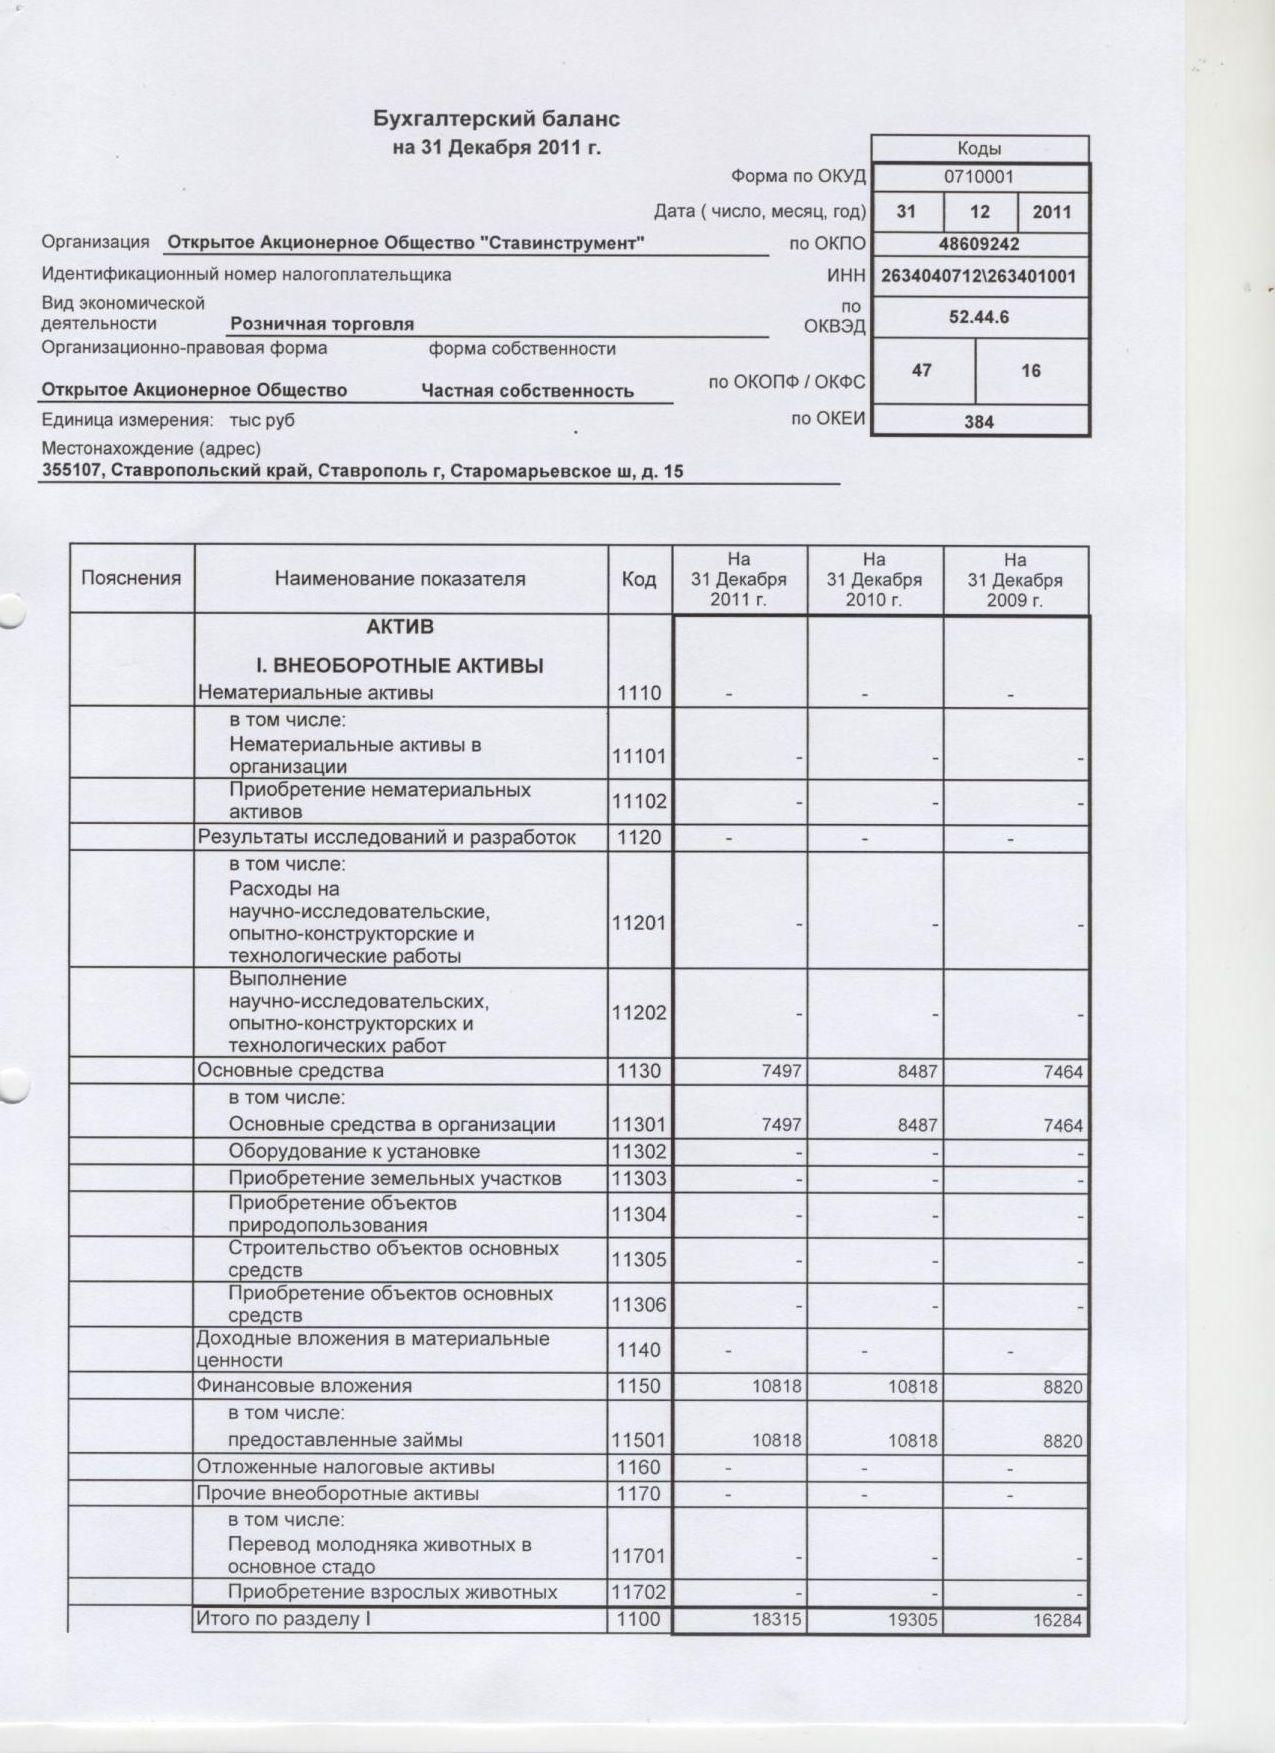 Бухгалтерский баланс на 31 декабря 2011